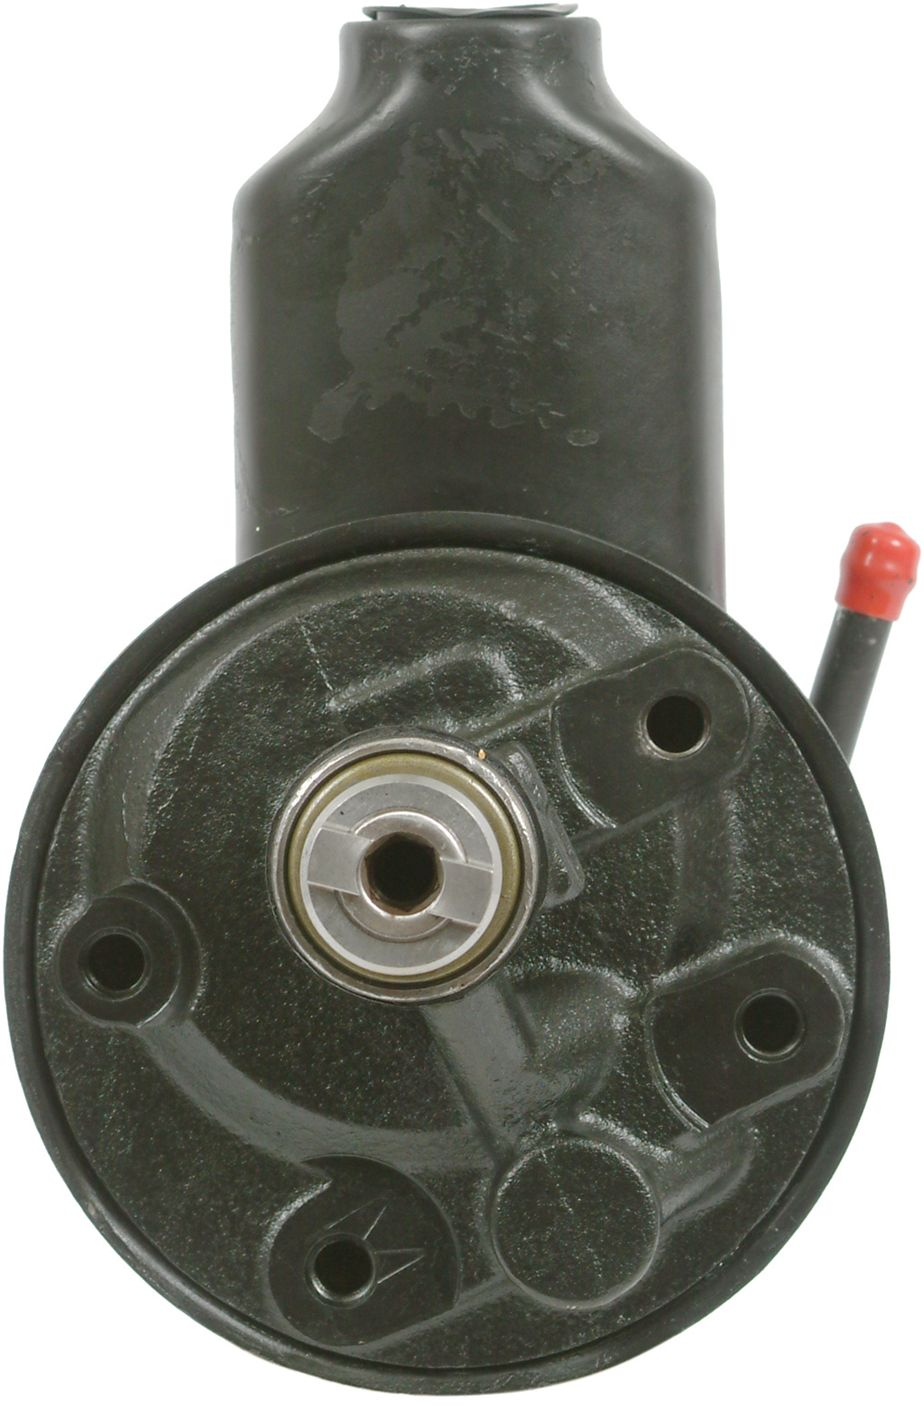 hight resolution of  1996 dodge ram 2500 power steering pump a1 20 8001